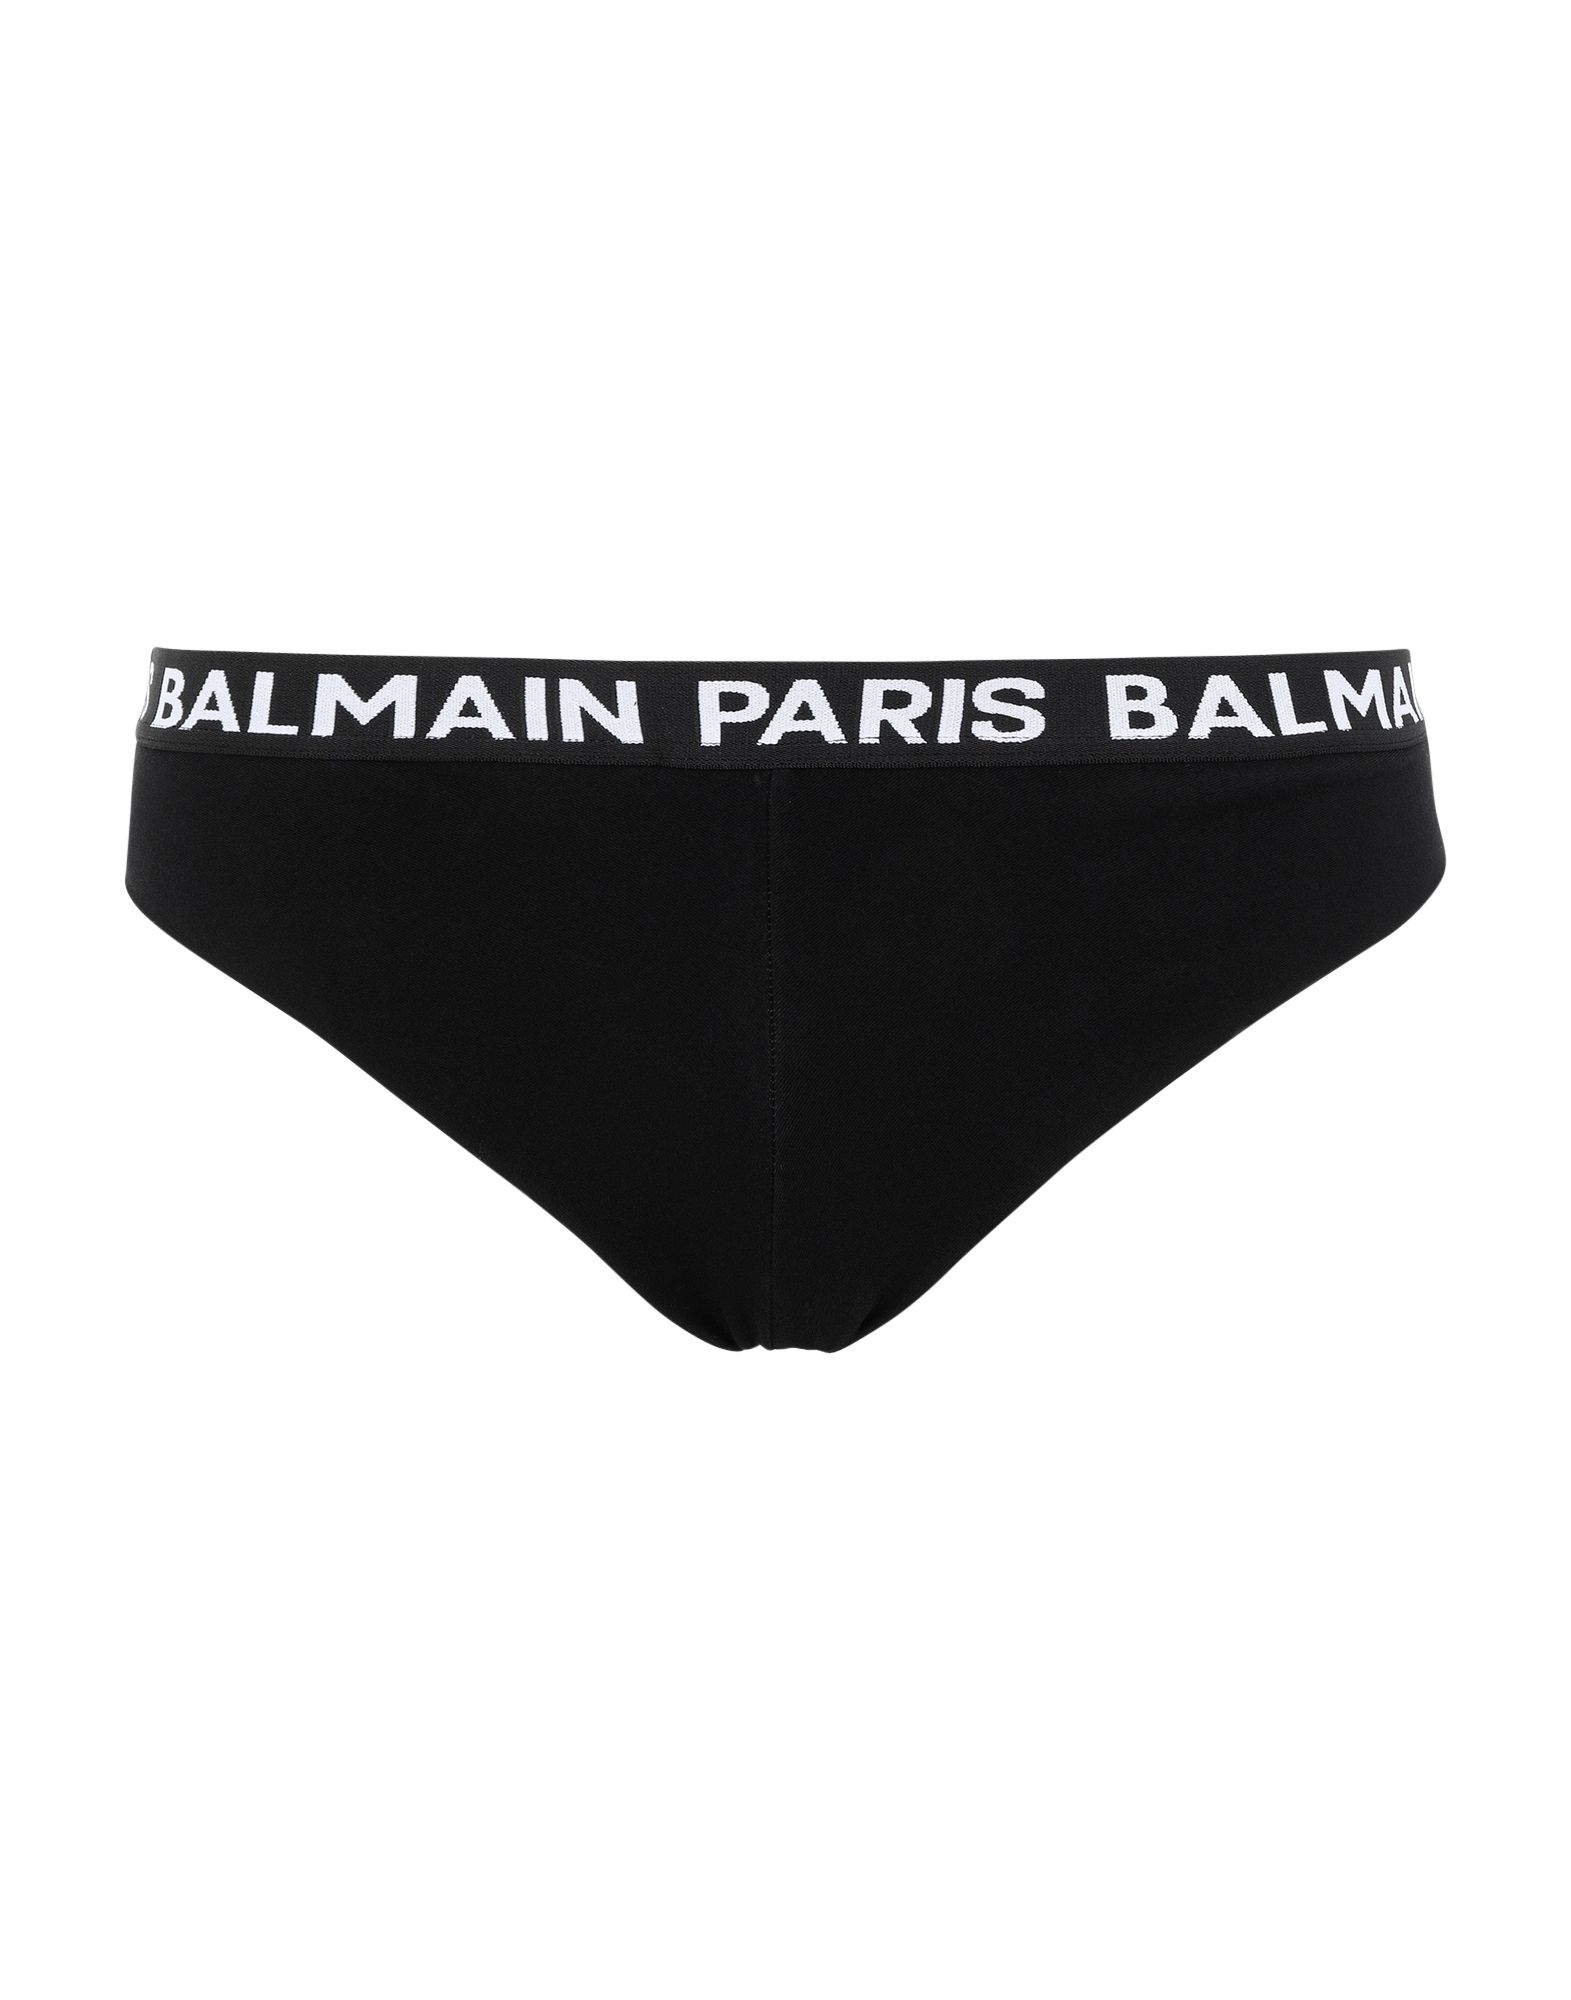 BALMAIN Briefs. jersey, logo, solid color, elasticized waist, semi-lined, stretch. 80% Cotton, 20% Elastane